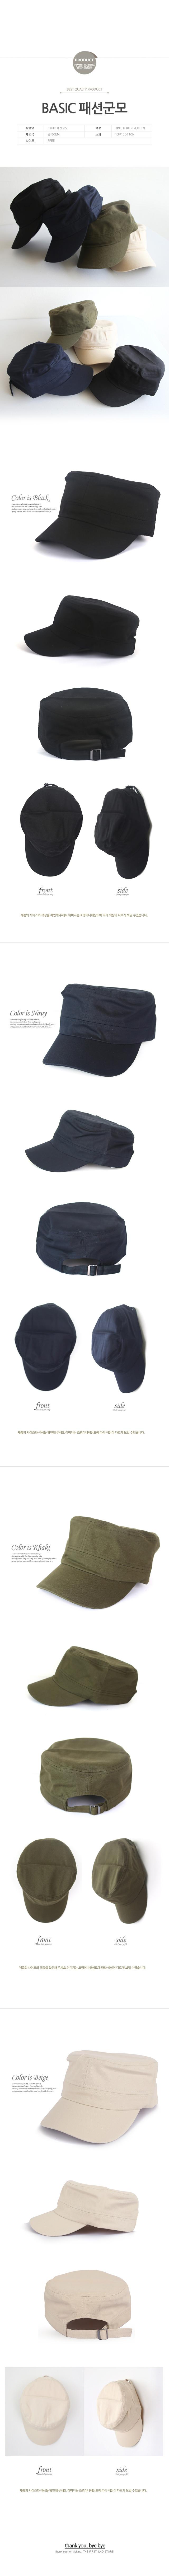 BASIC fashion captain